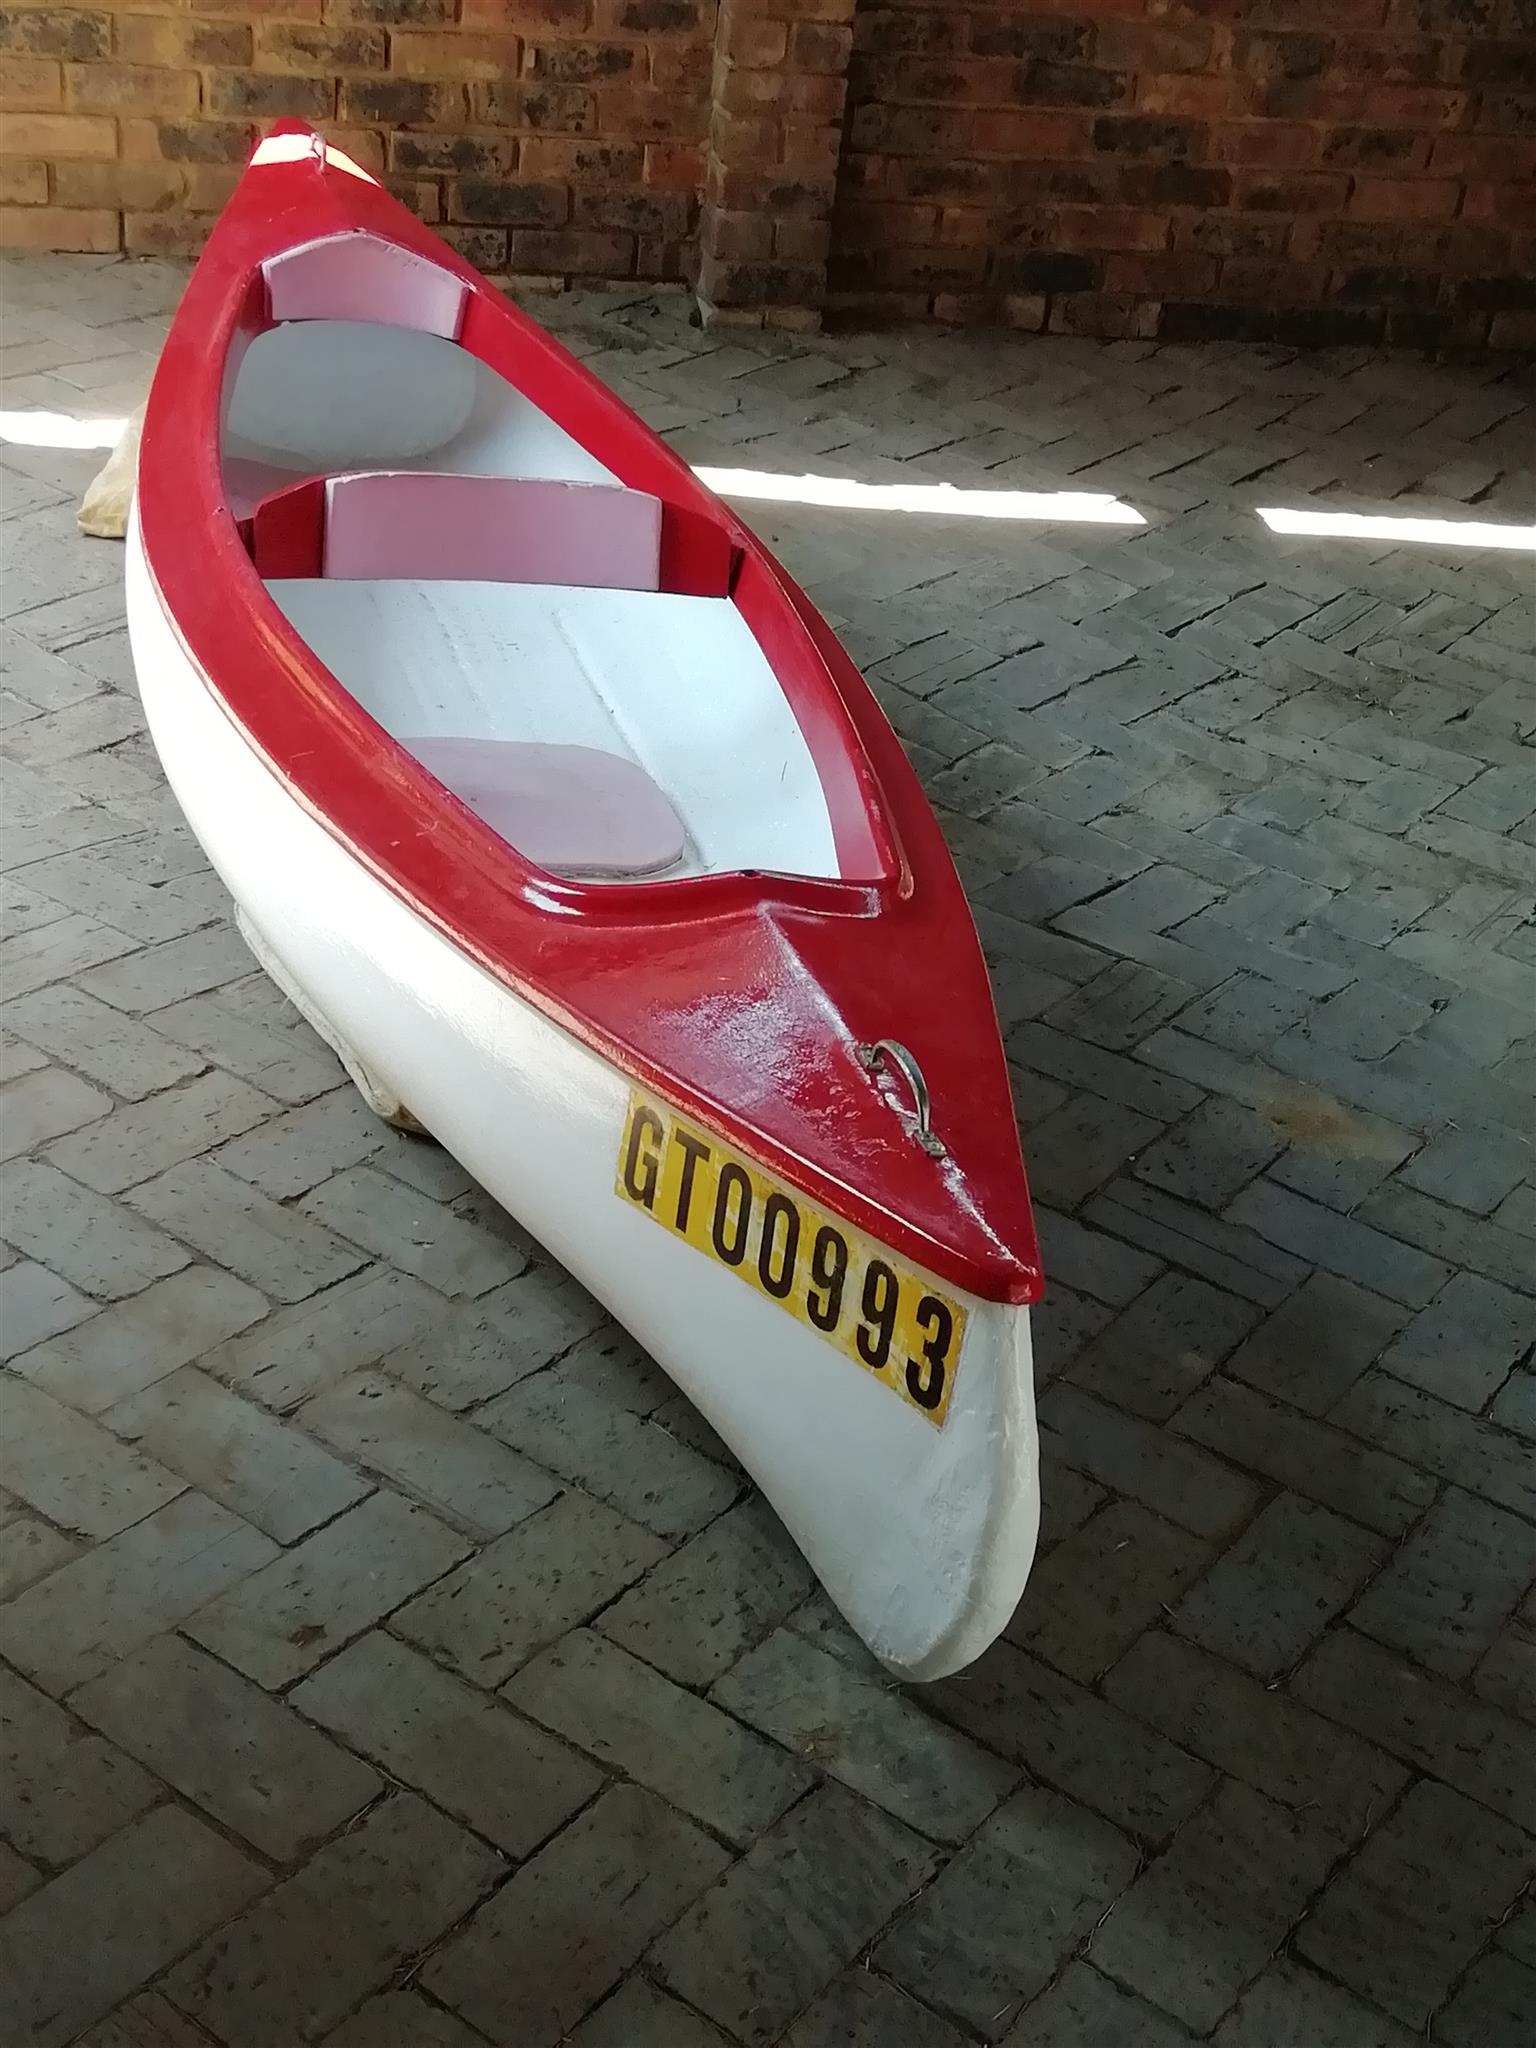 Bargain!!! Fibre glass double seater canoe